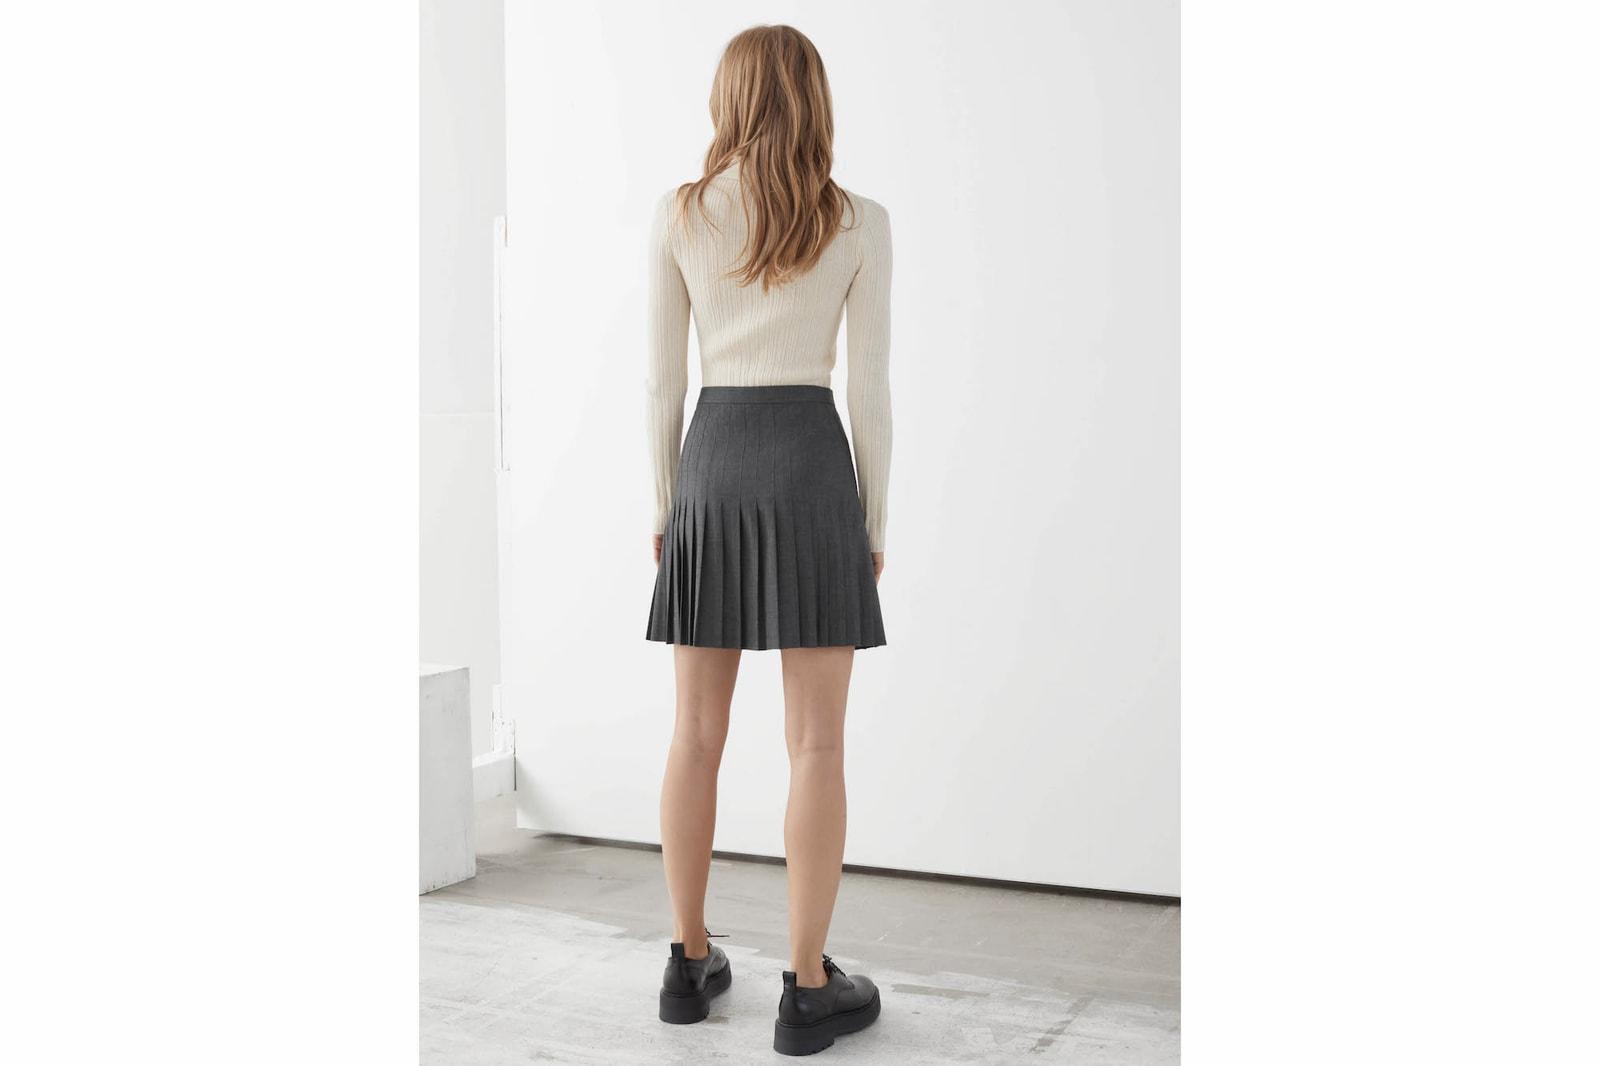 Pleated Skirt Trend Best Fall/Winter Pieces Valentino Prada Sacai MM6 Maison Margiela ARKET